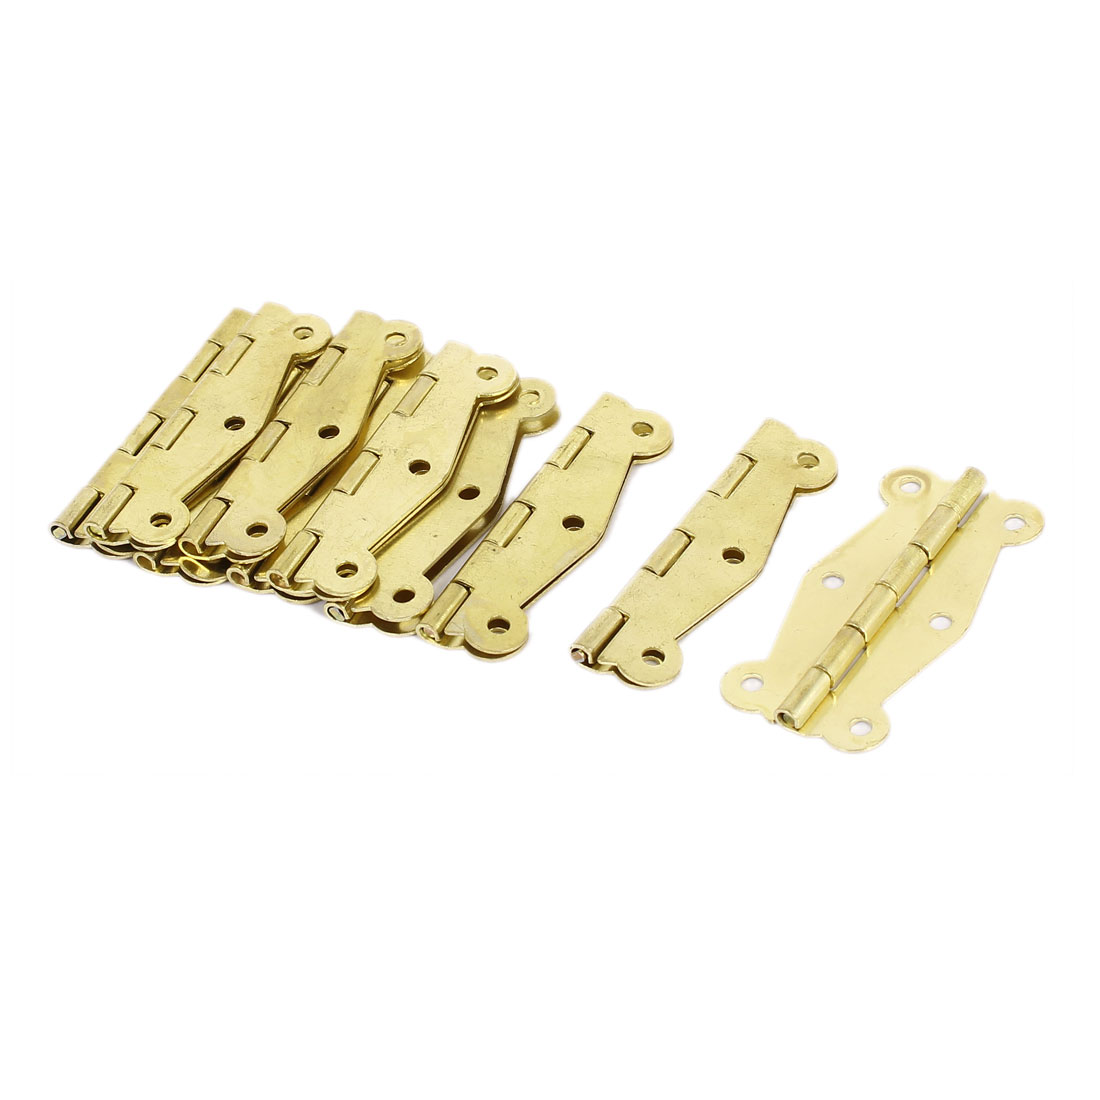 Closet Cabinet 6-Hole Door Butt Hinge Gold Tone 51mm x 24mm 10PCS